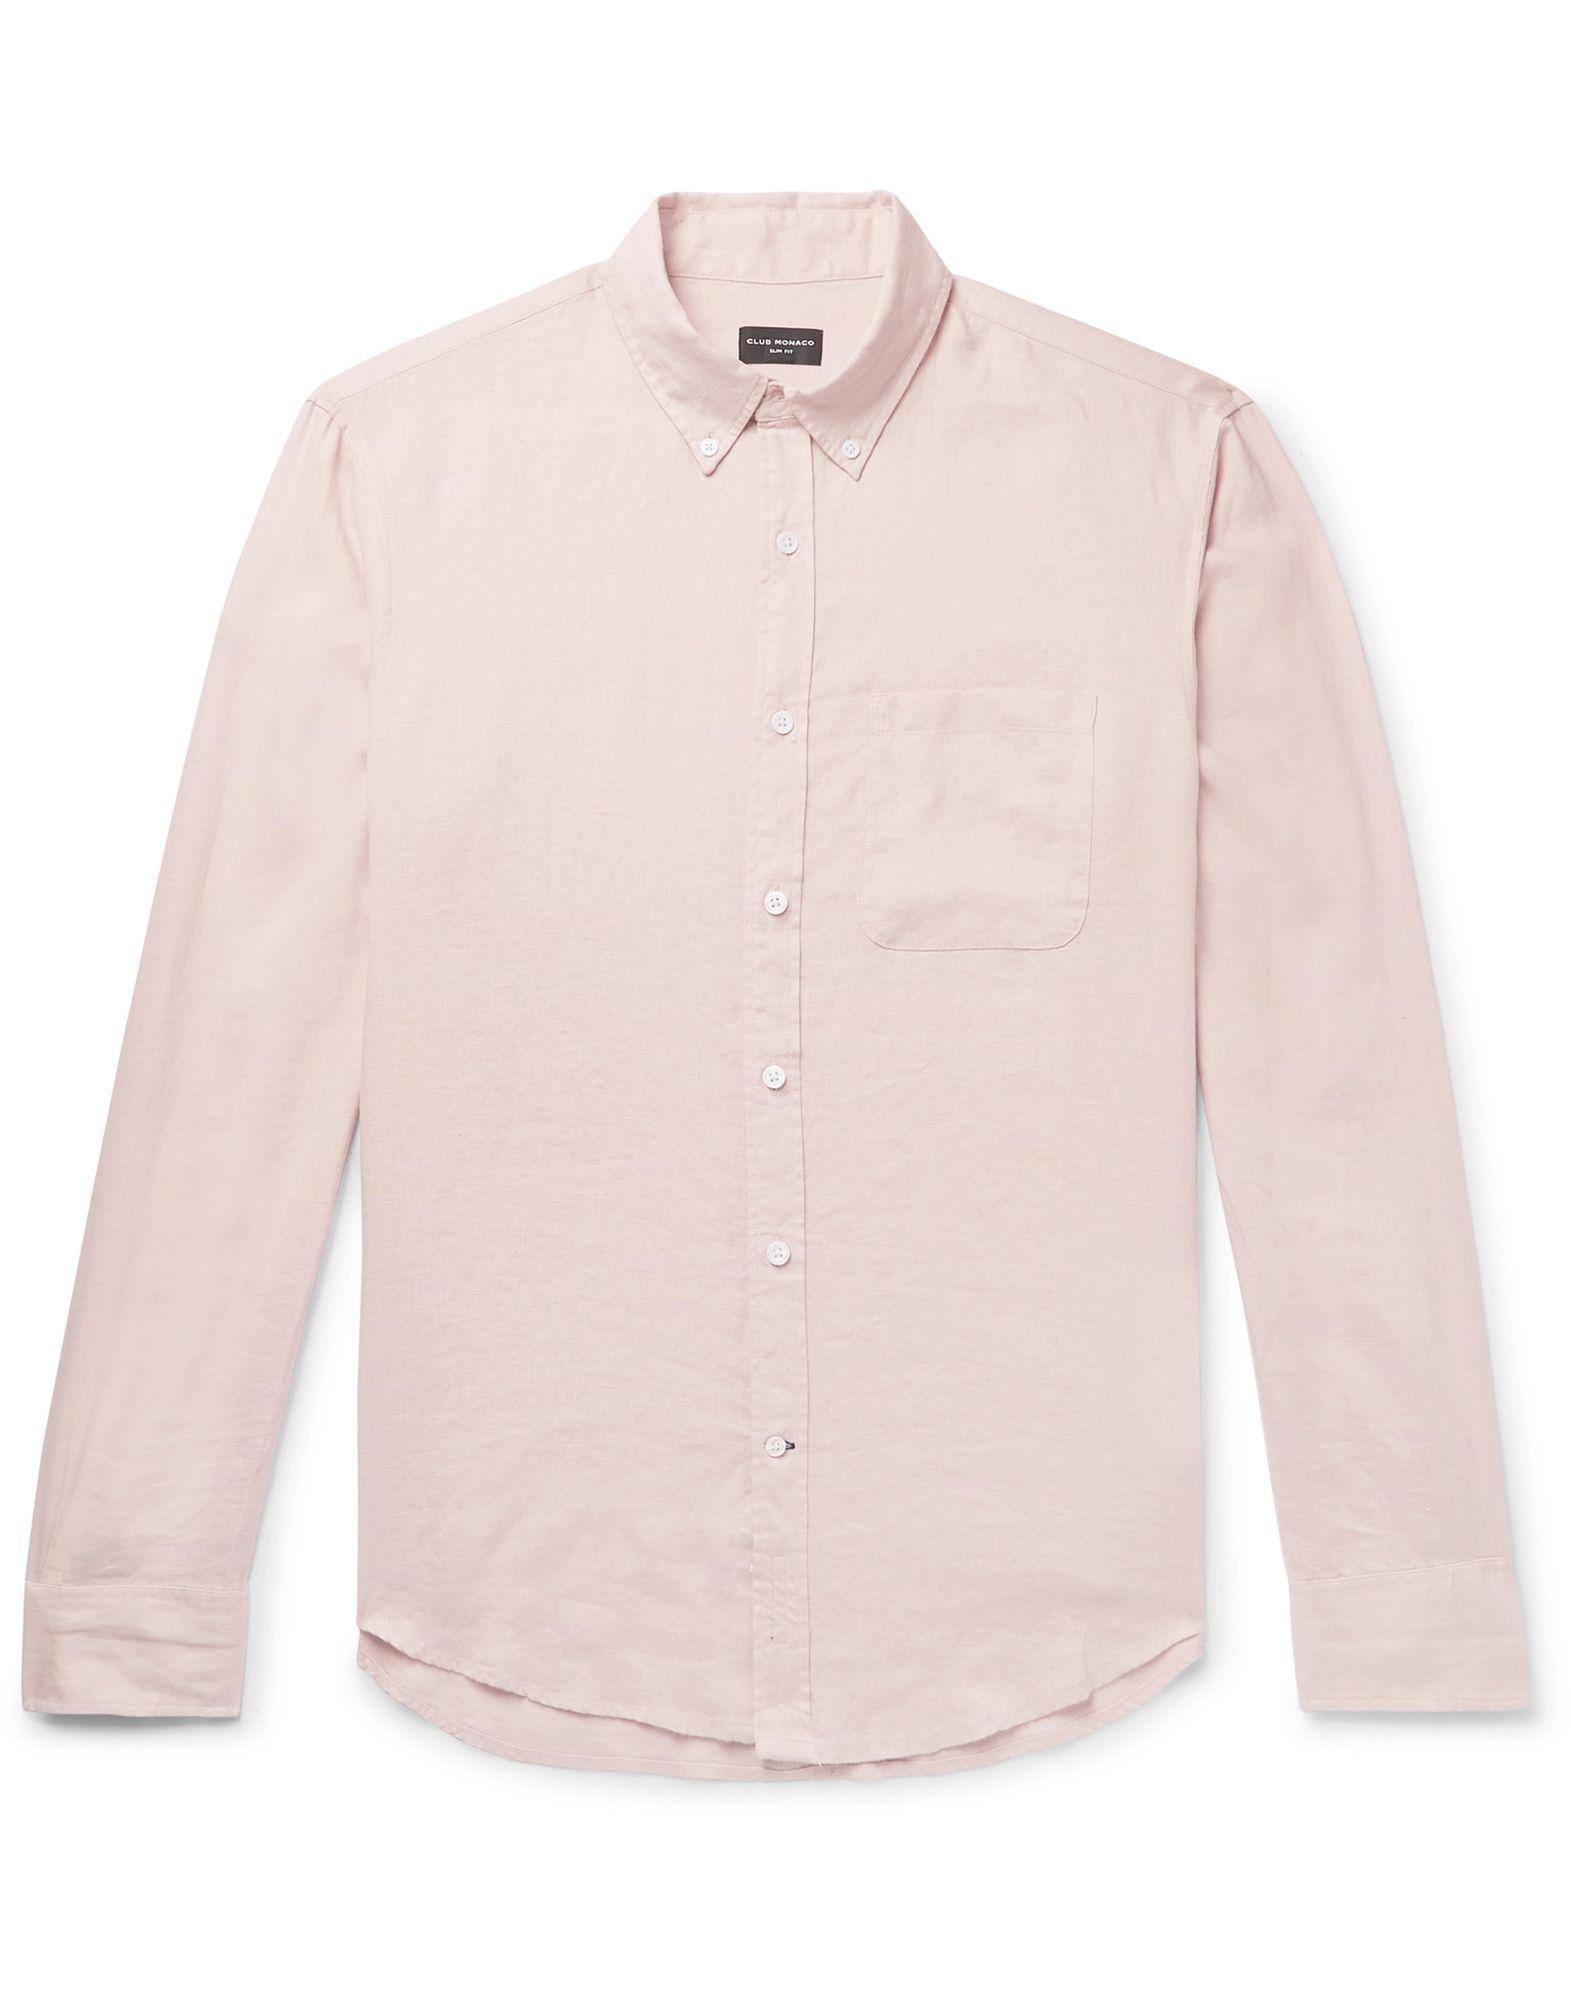 CLUB MONACO Shirts. plain weave, no appliqués, basic solid color, front closure, button closing, long sleeves, buttoned cuffs, button-down collar, single chest pocket. 100% Linen